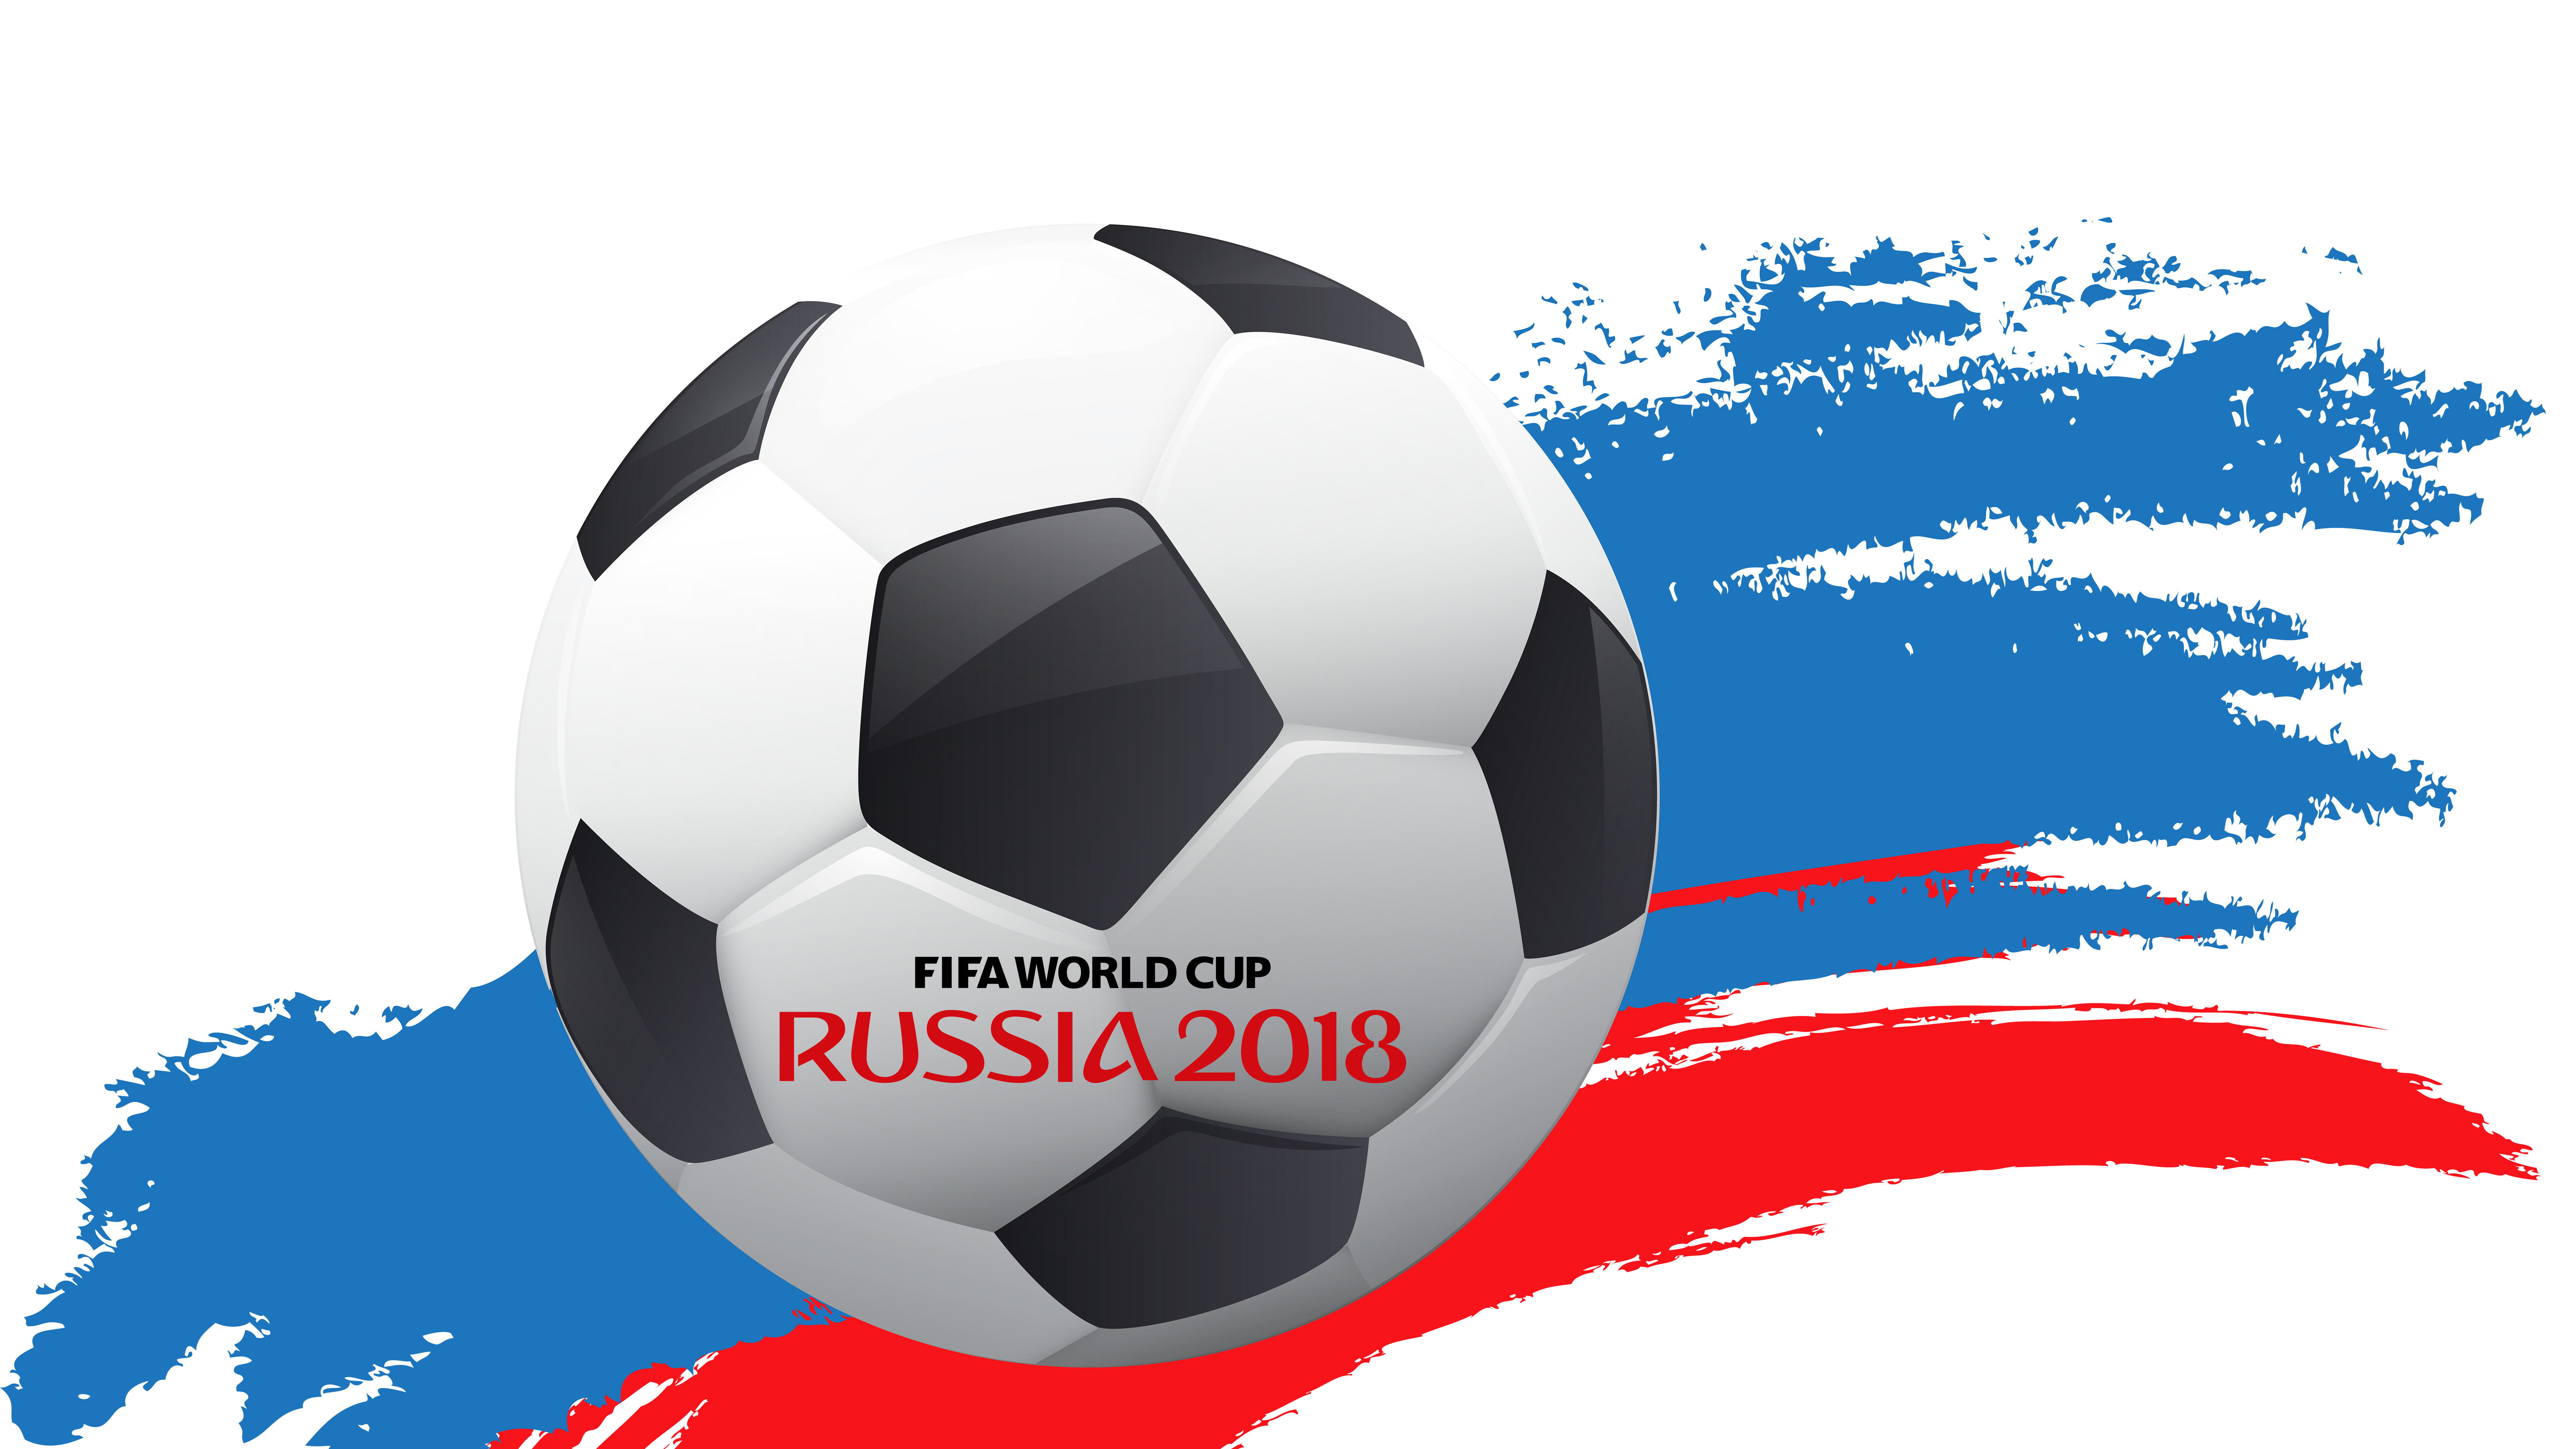 Fifa World Cup 2018 Wallpaper: 2560x1080 FIFA World Cup Russia 2018 8k 2560x1080